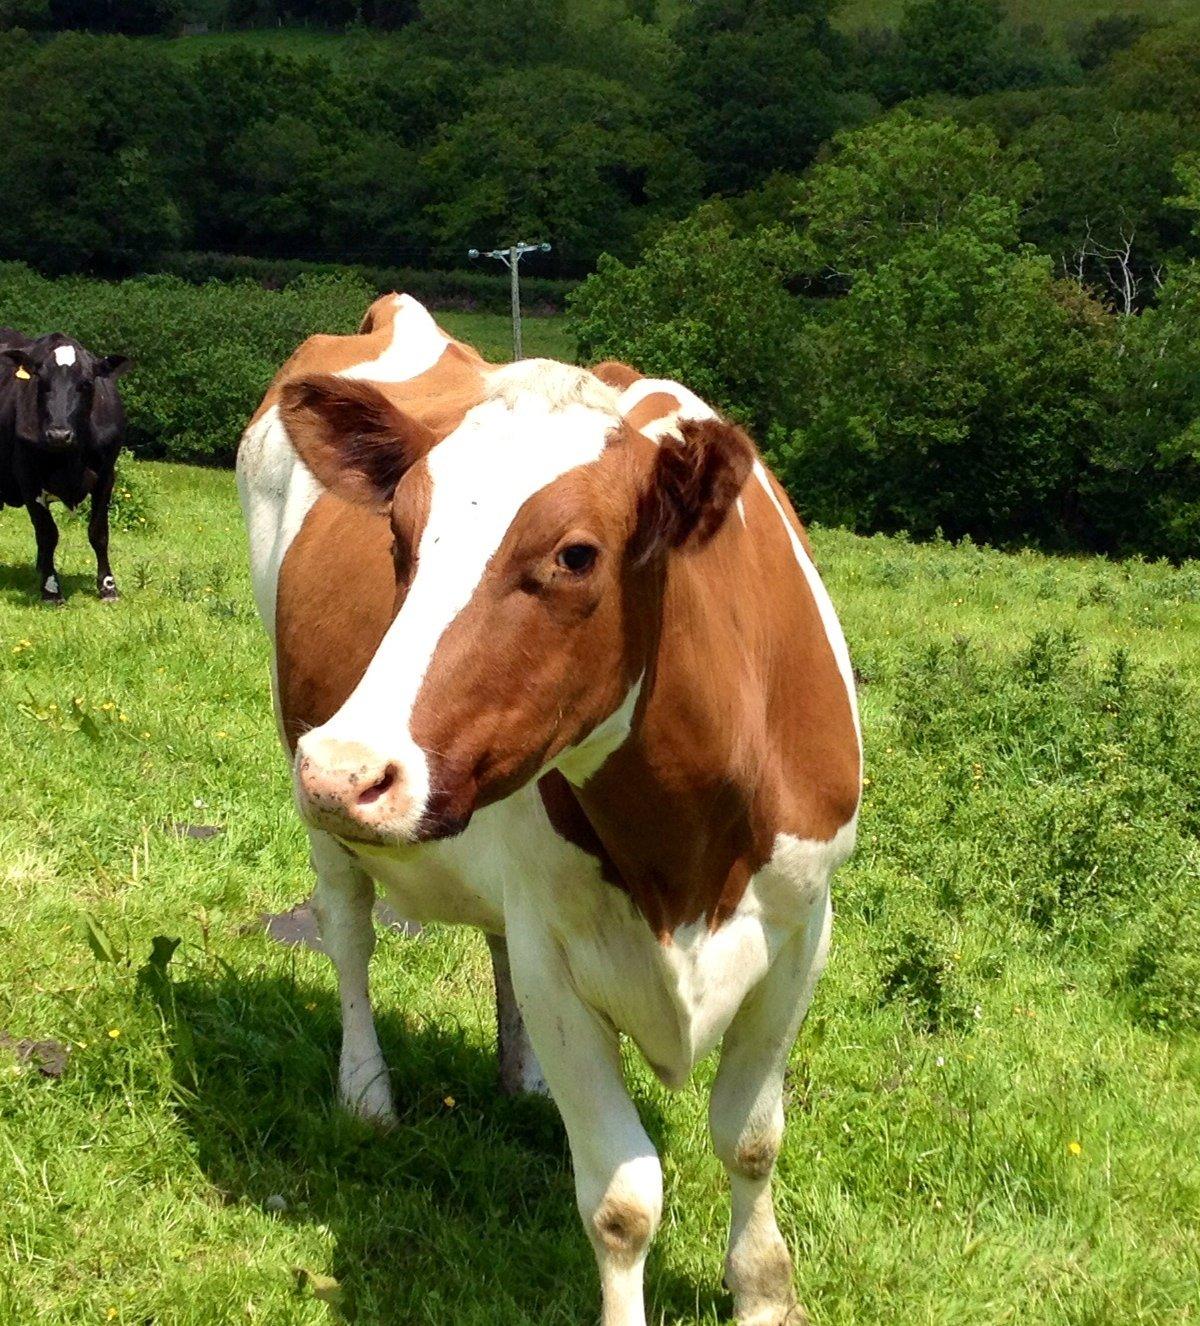 Free Range Dairy Cow